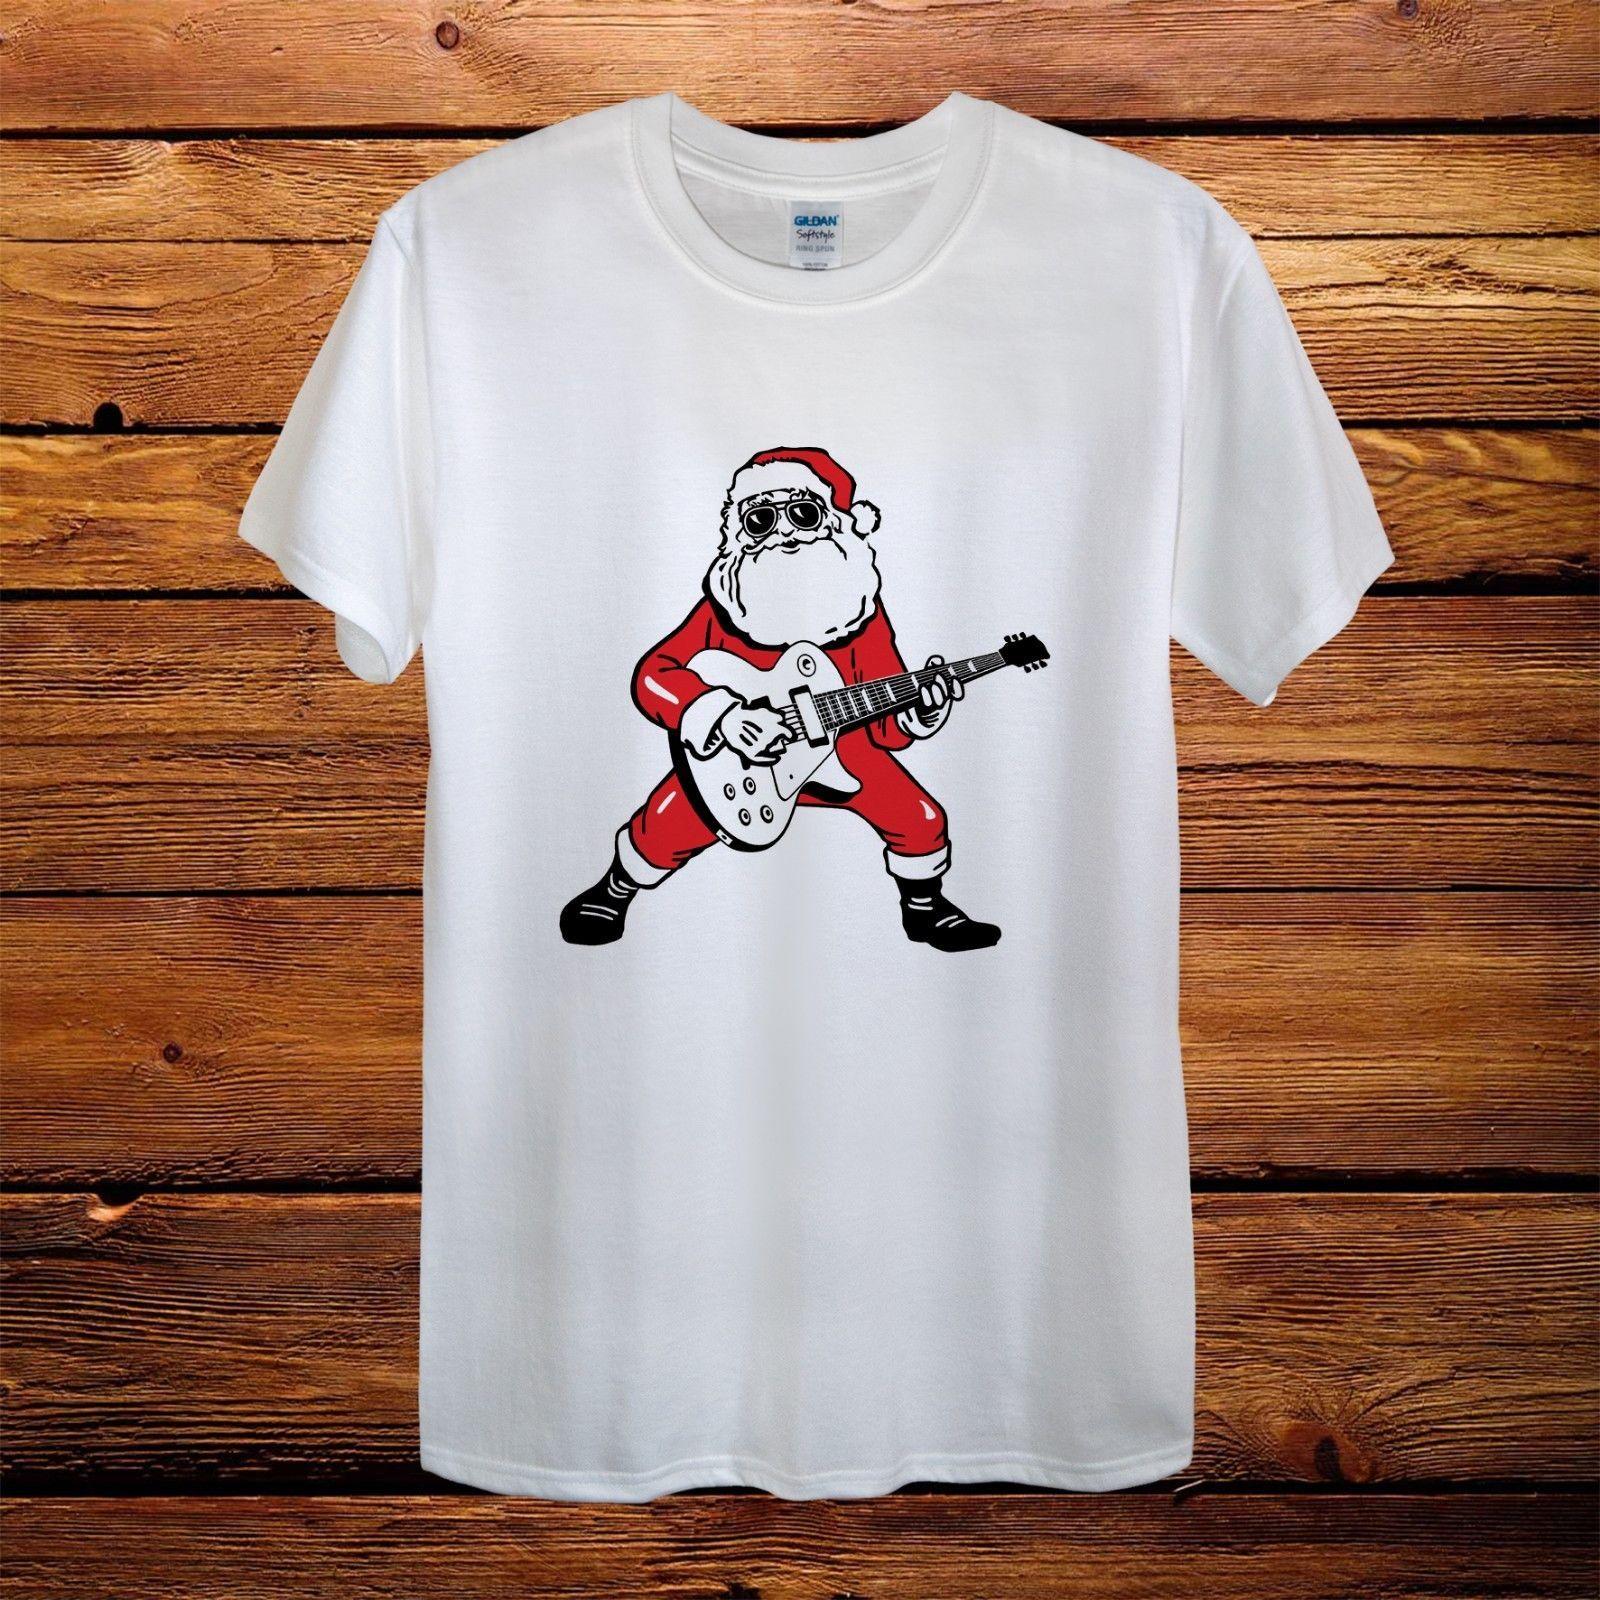 14ad3f52 Santa Claus Rocker Merry Christmas Gift T Shirt Men Unisex Women  FittedFunny Unisex Casual Tshirt Top Humorous T Shirts T Shirts Funny From  Thebestoree, ...